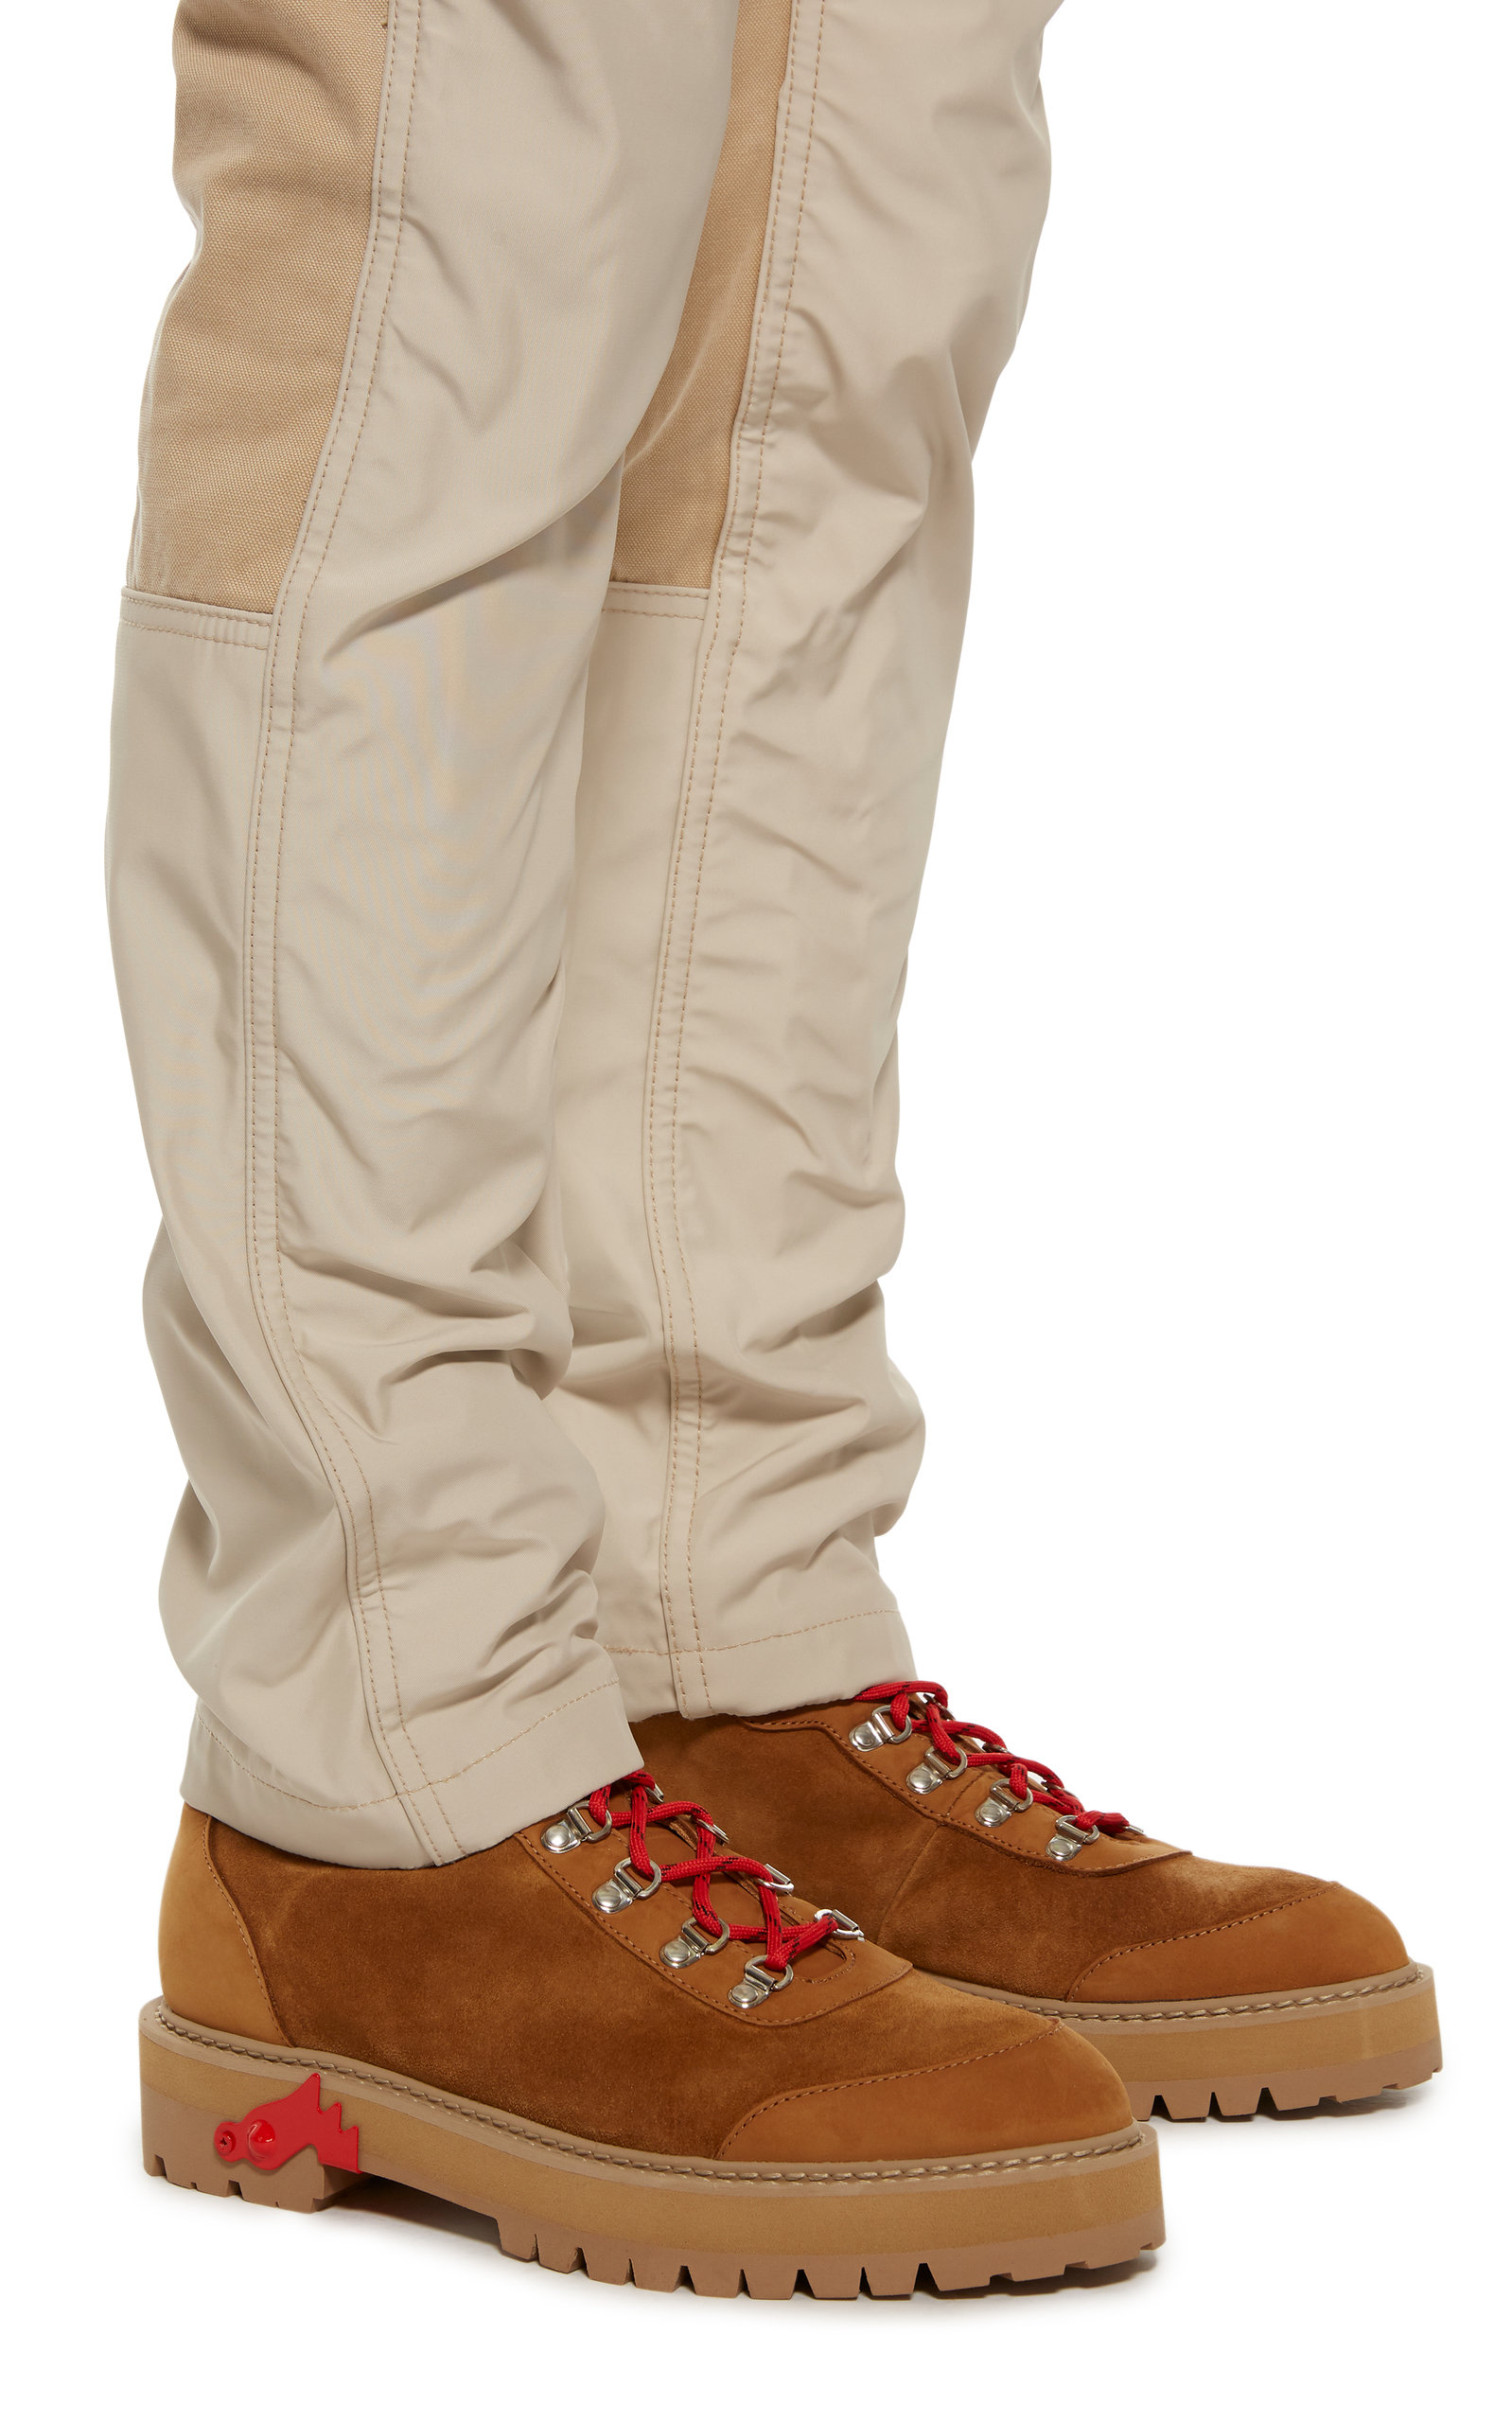 ebf8df00a2c2a Suede Hiking Boots by Off-White c/o Virgil Abloh   Moda Operandi